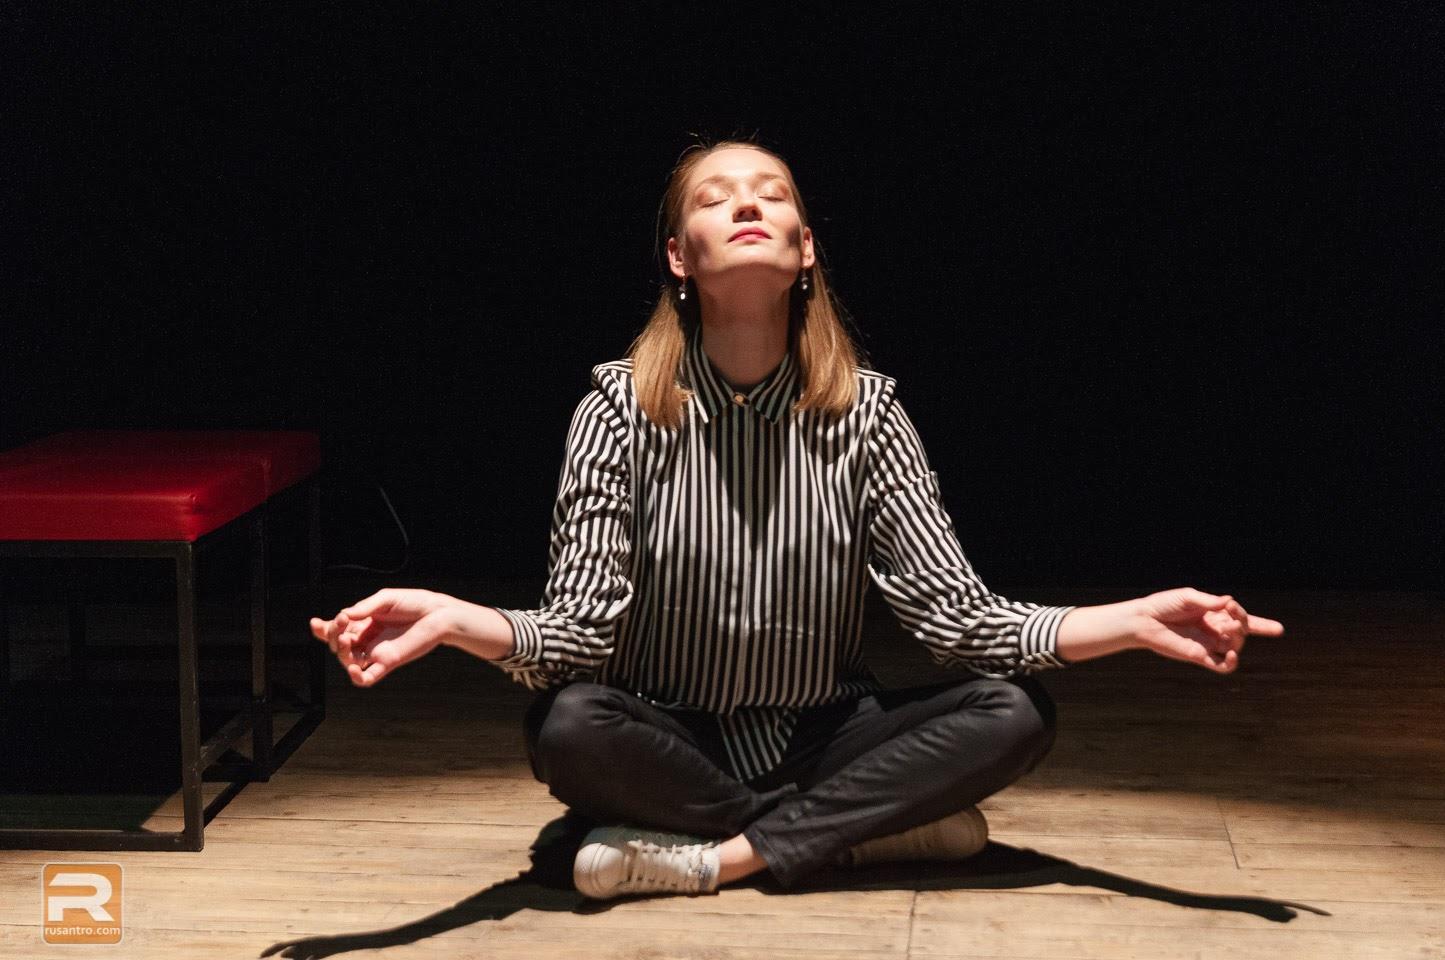 Sieviete meditē sakrustojot kājas